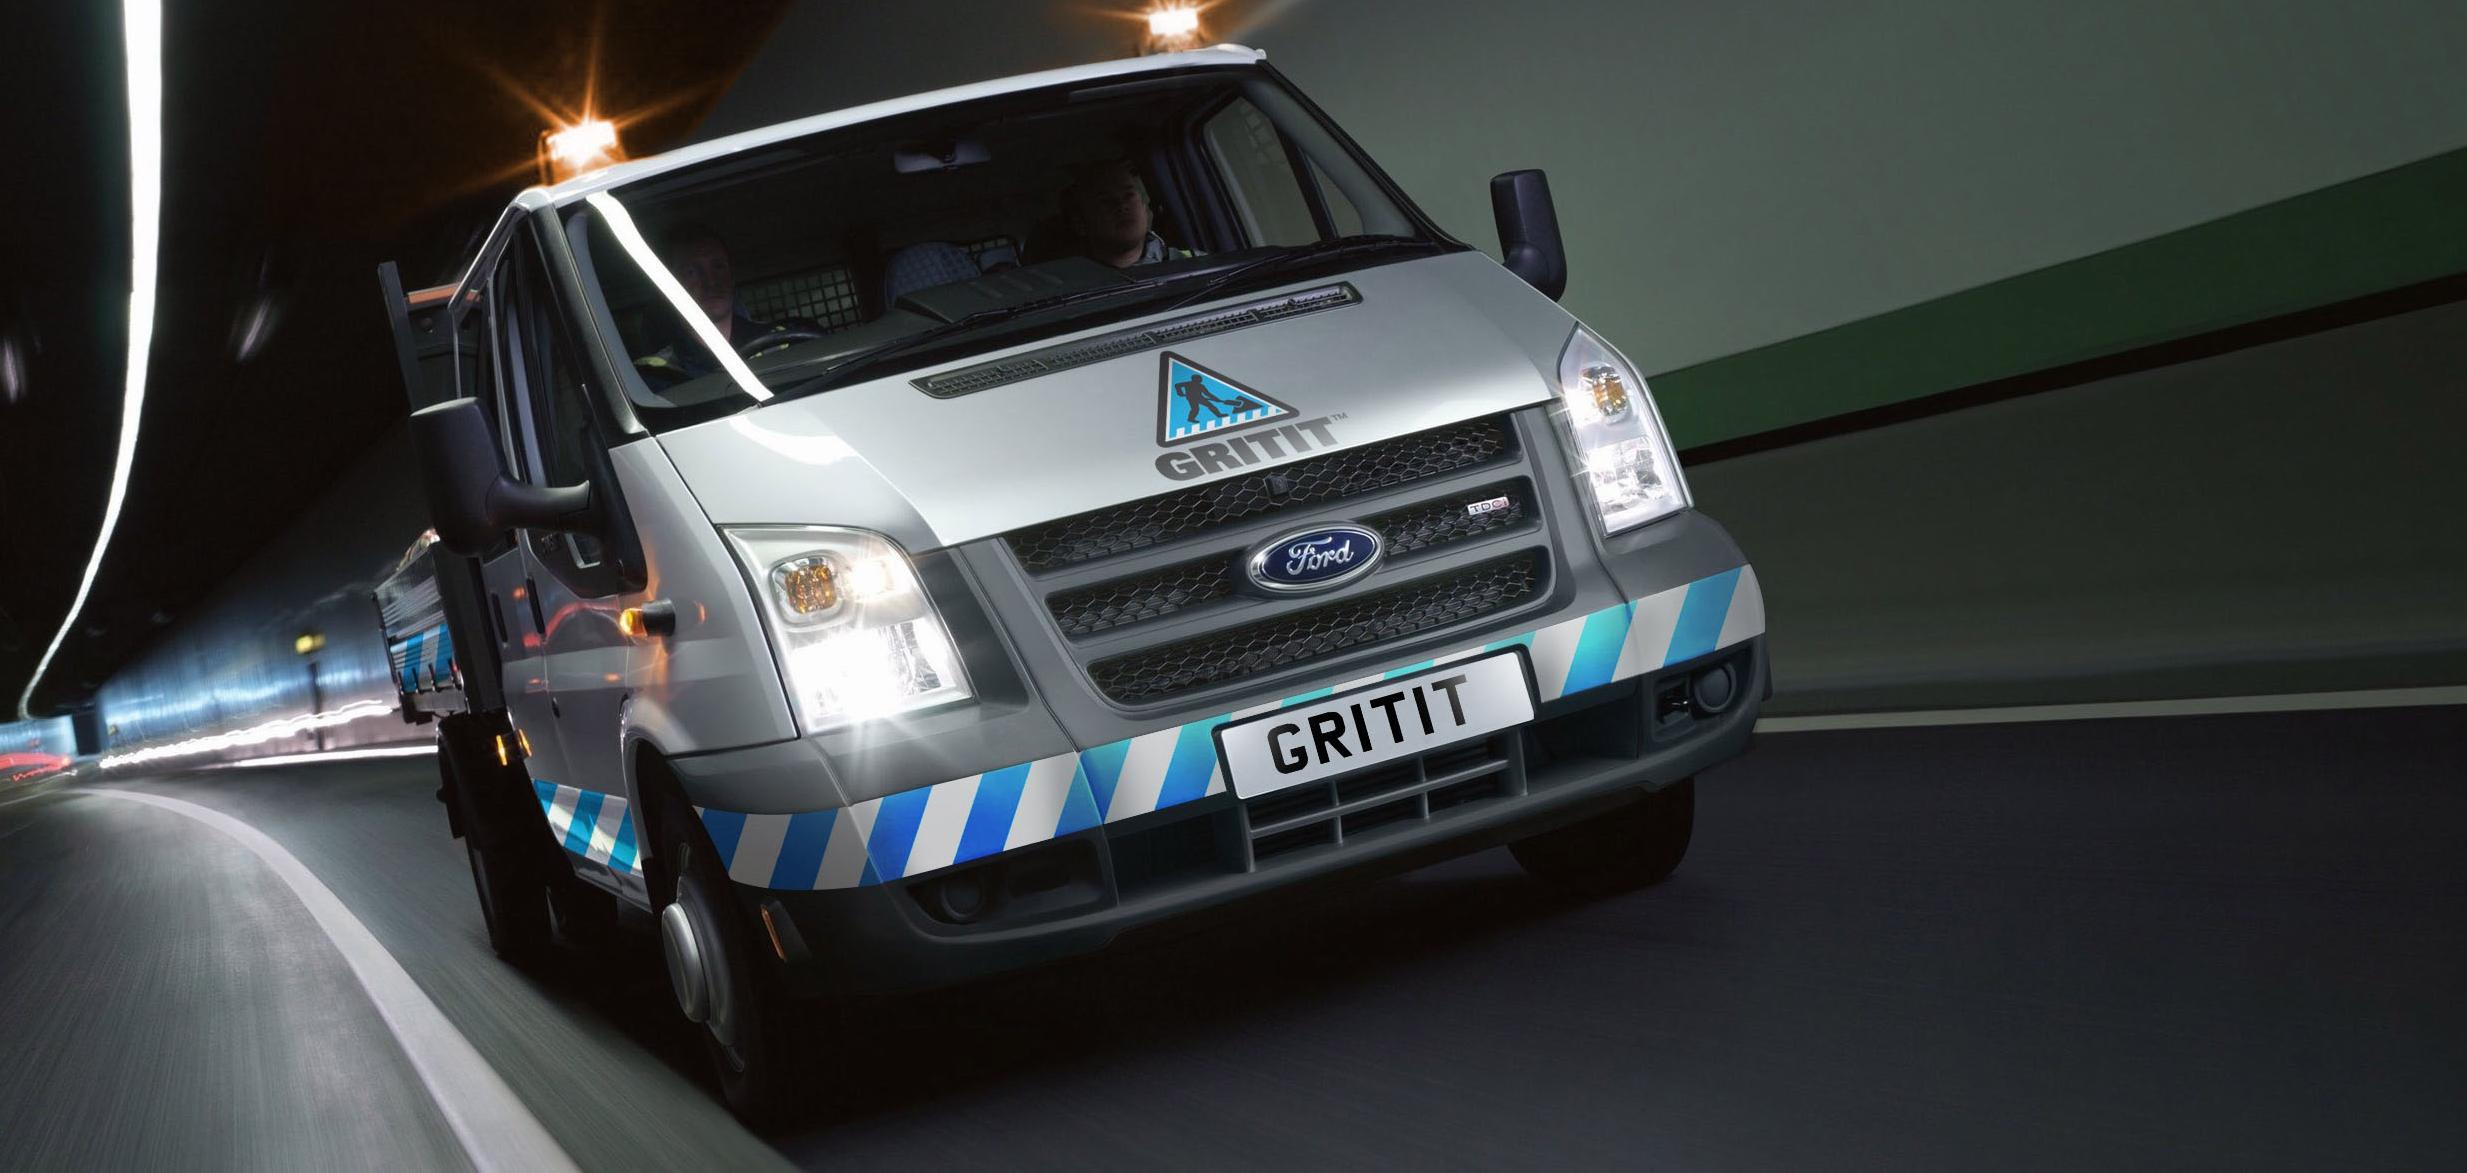 Image of a GRITIT van